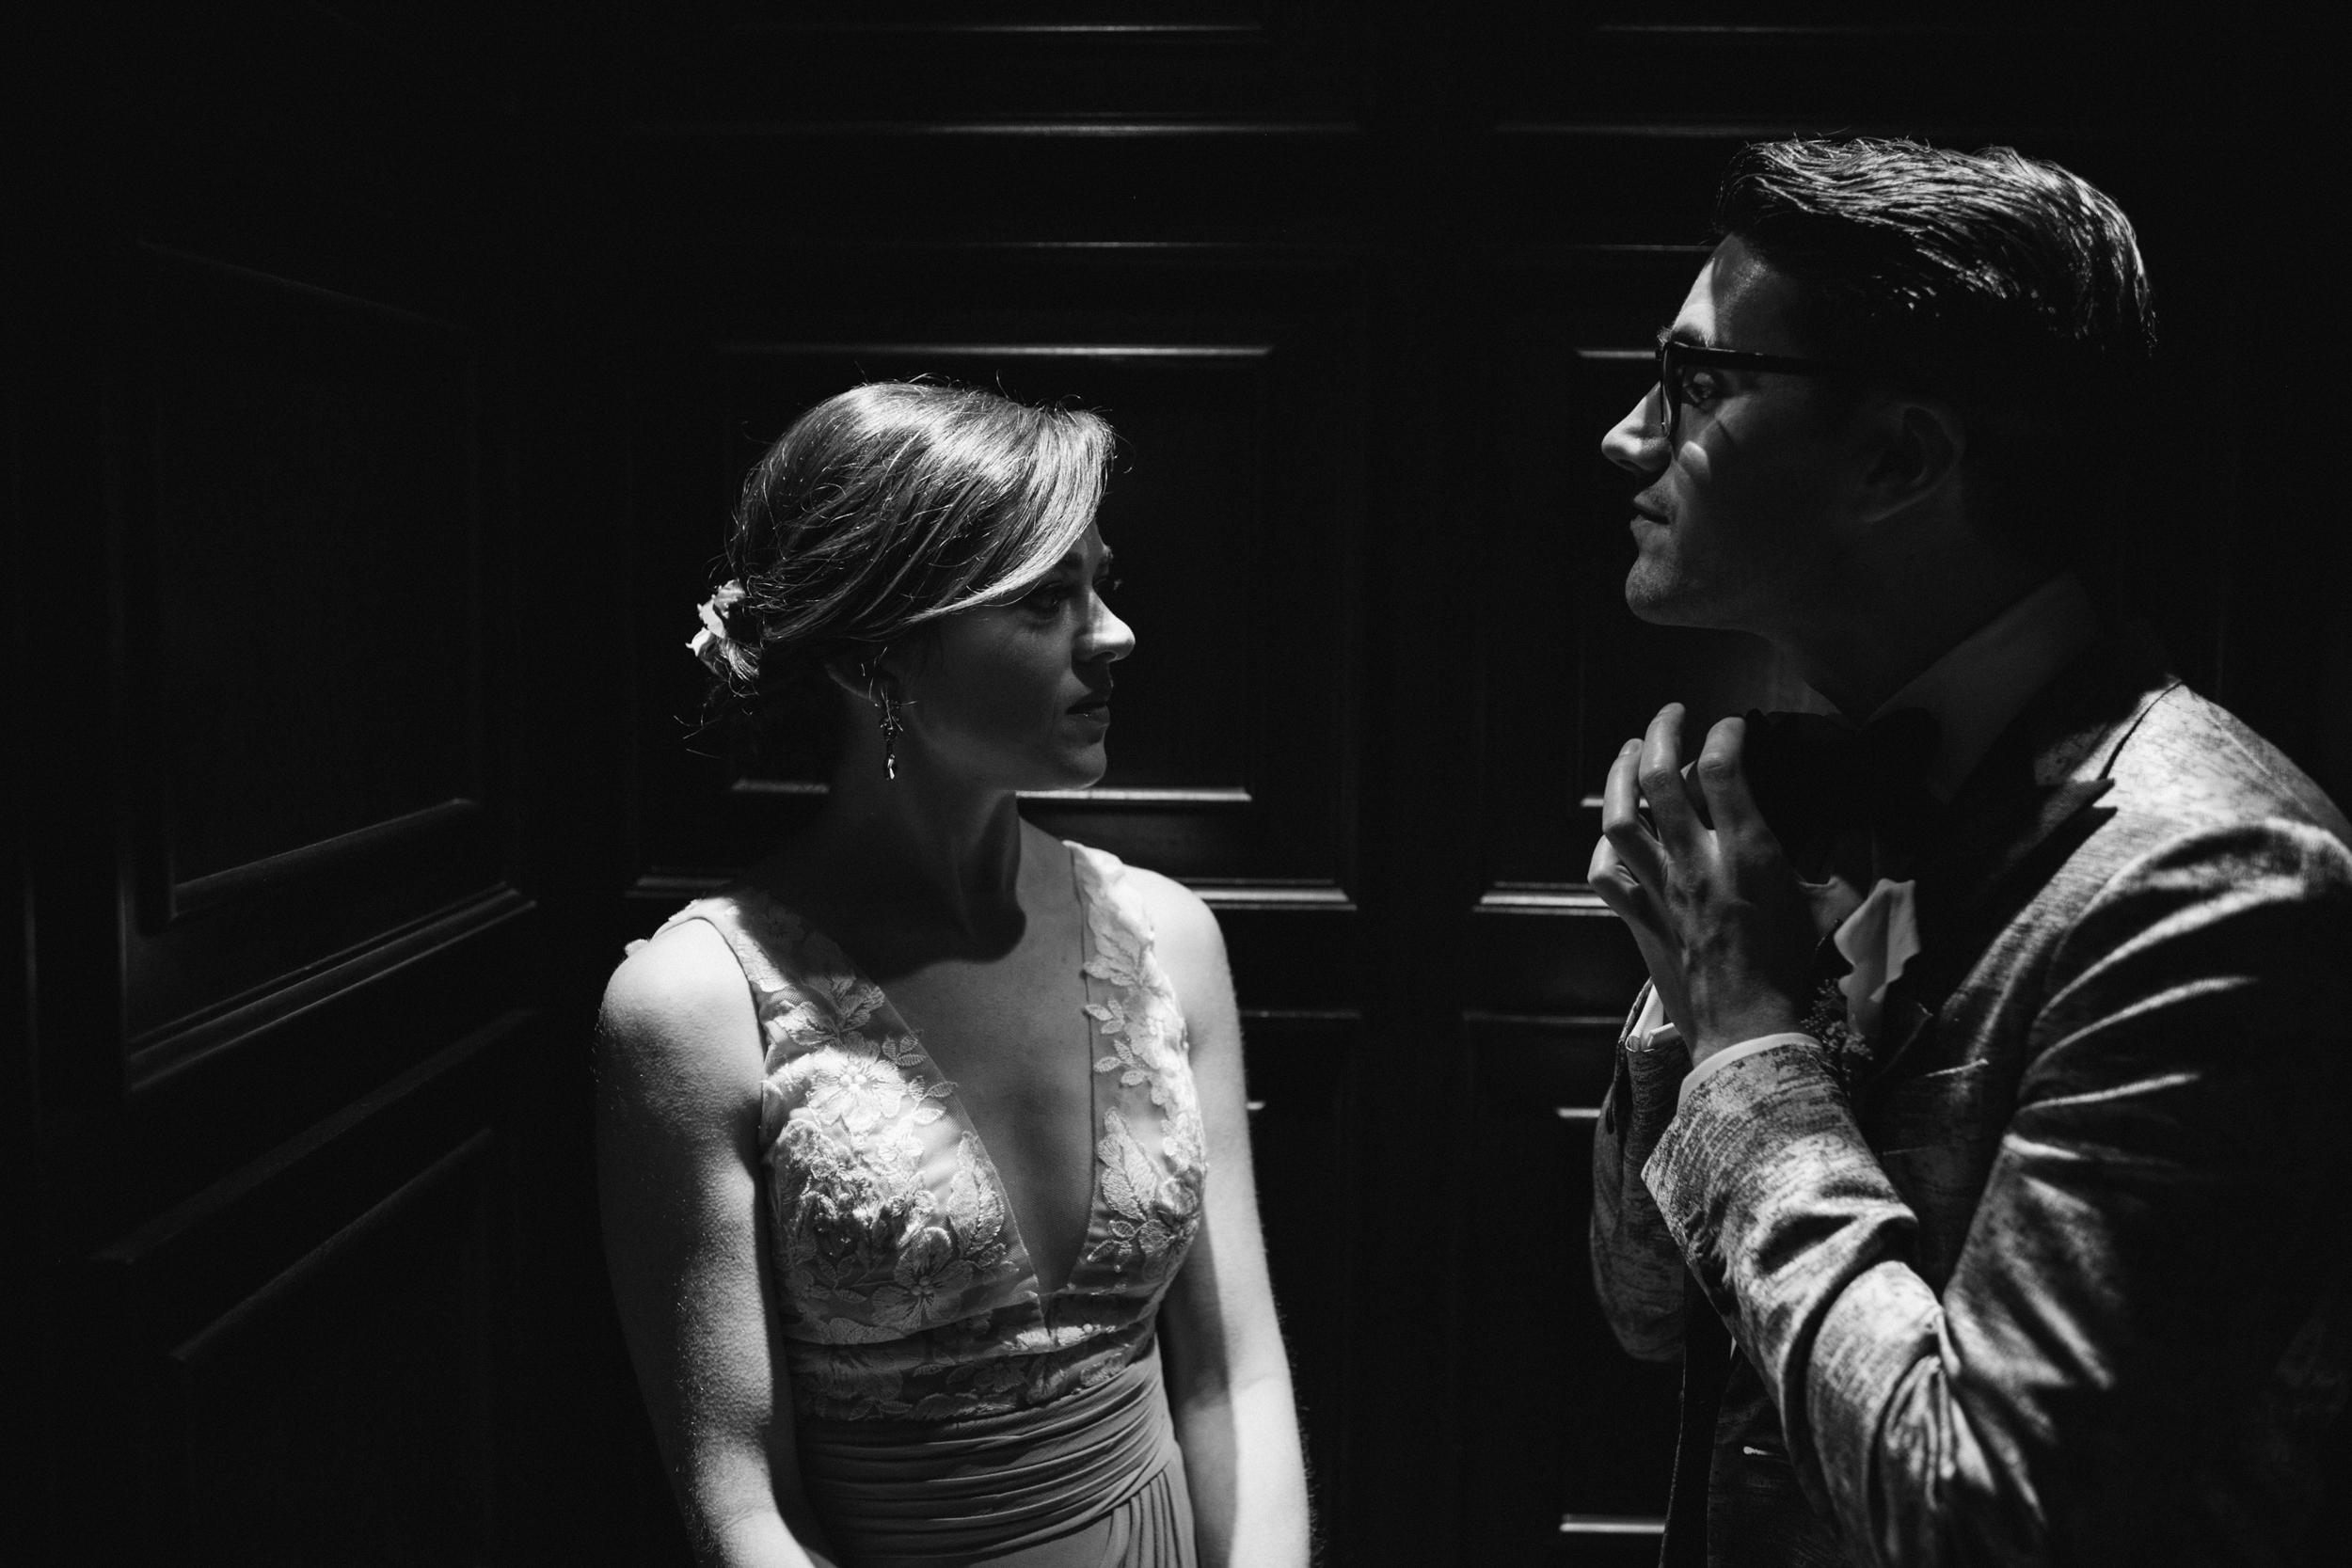 wedding_millwick_los_angeles-13.jpg